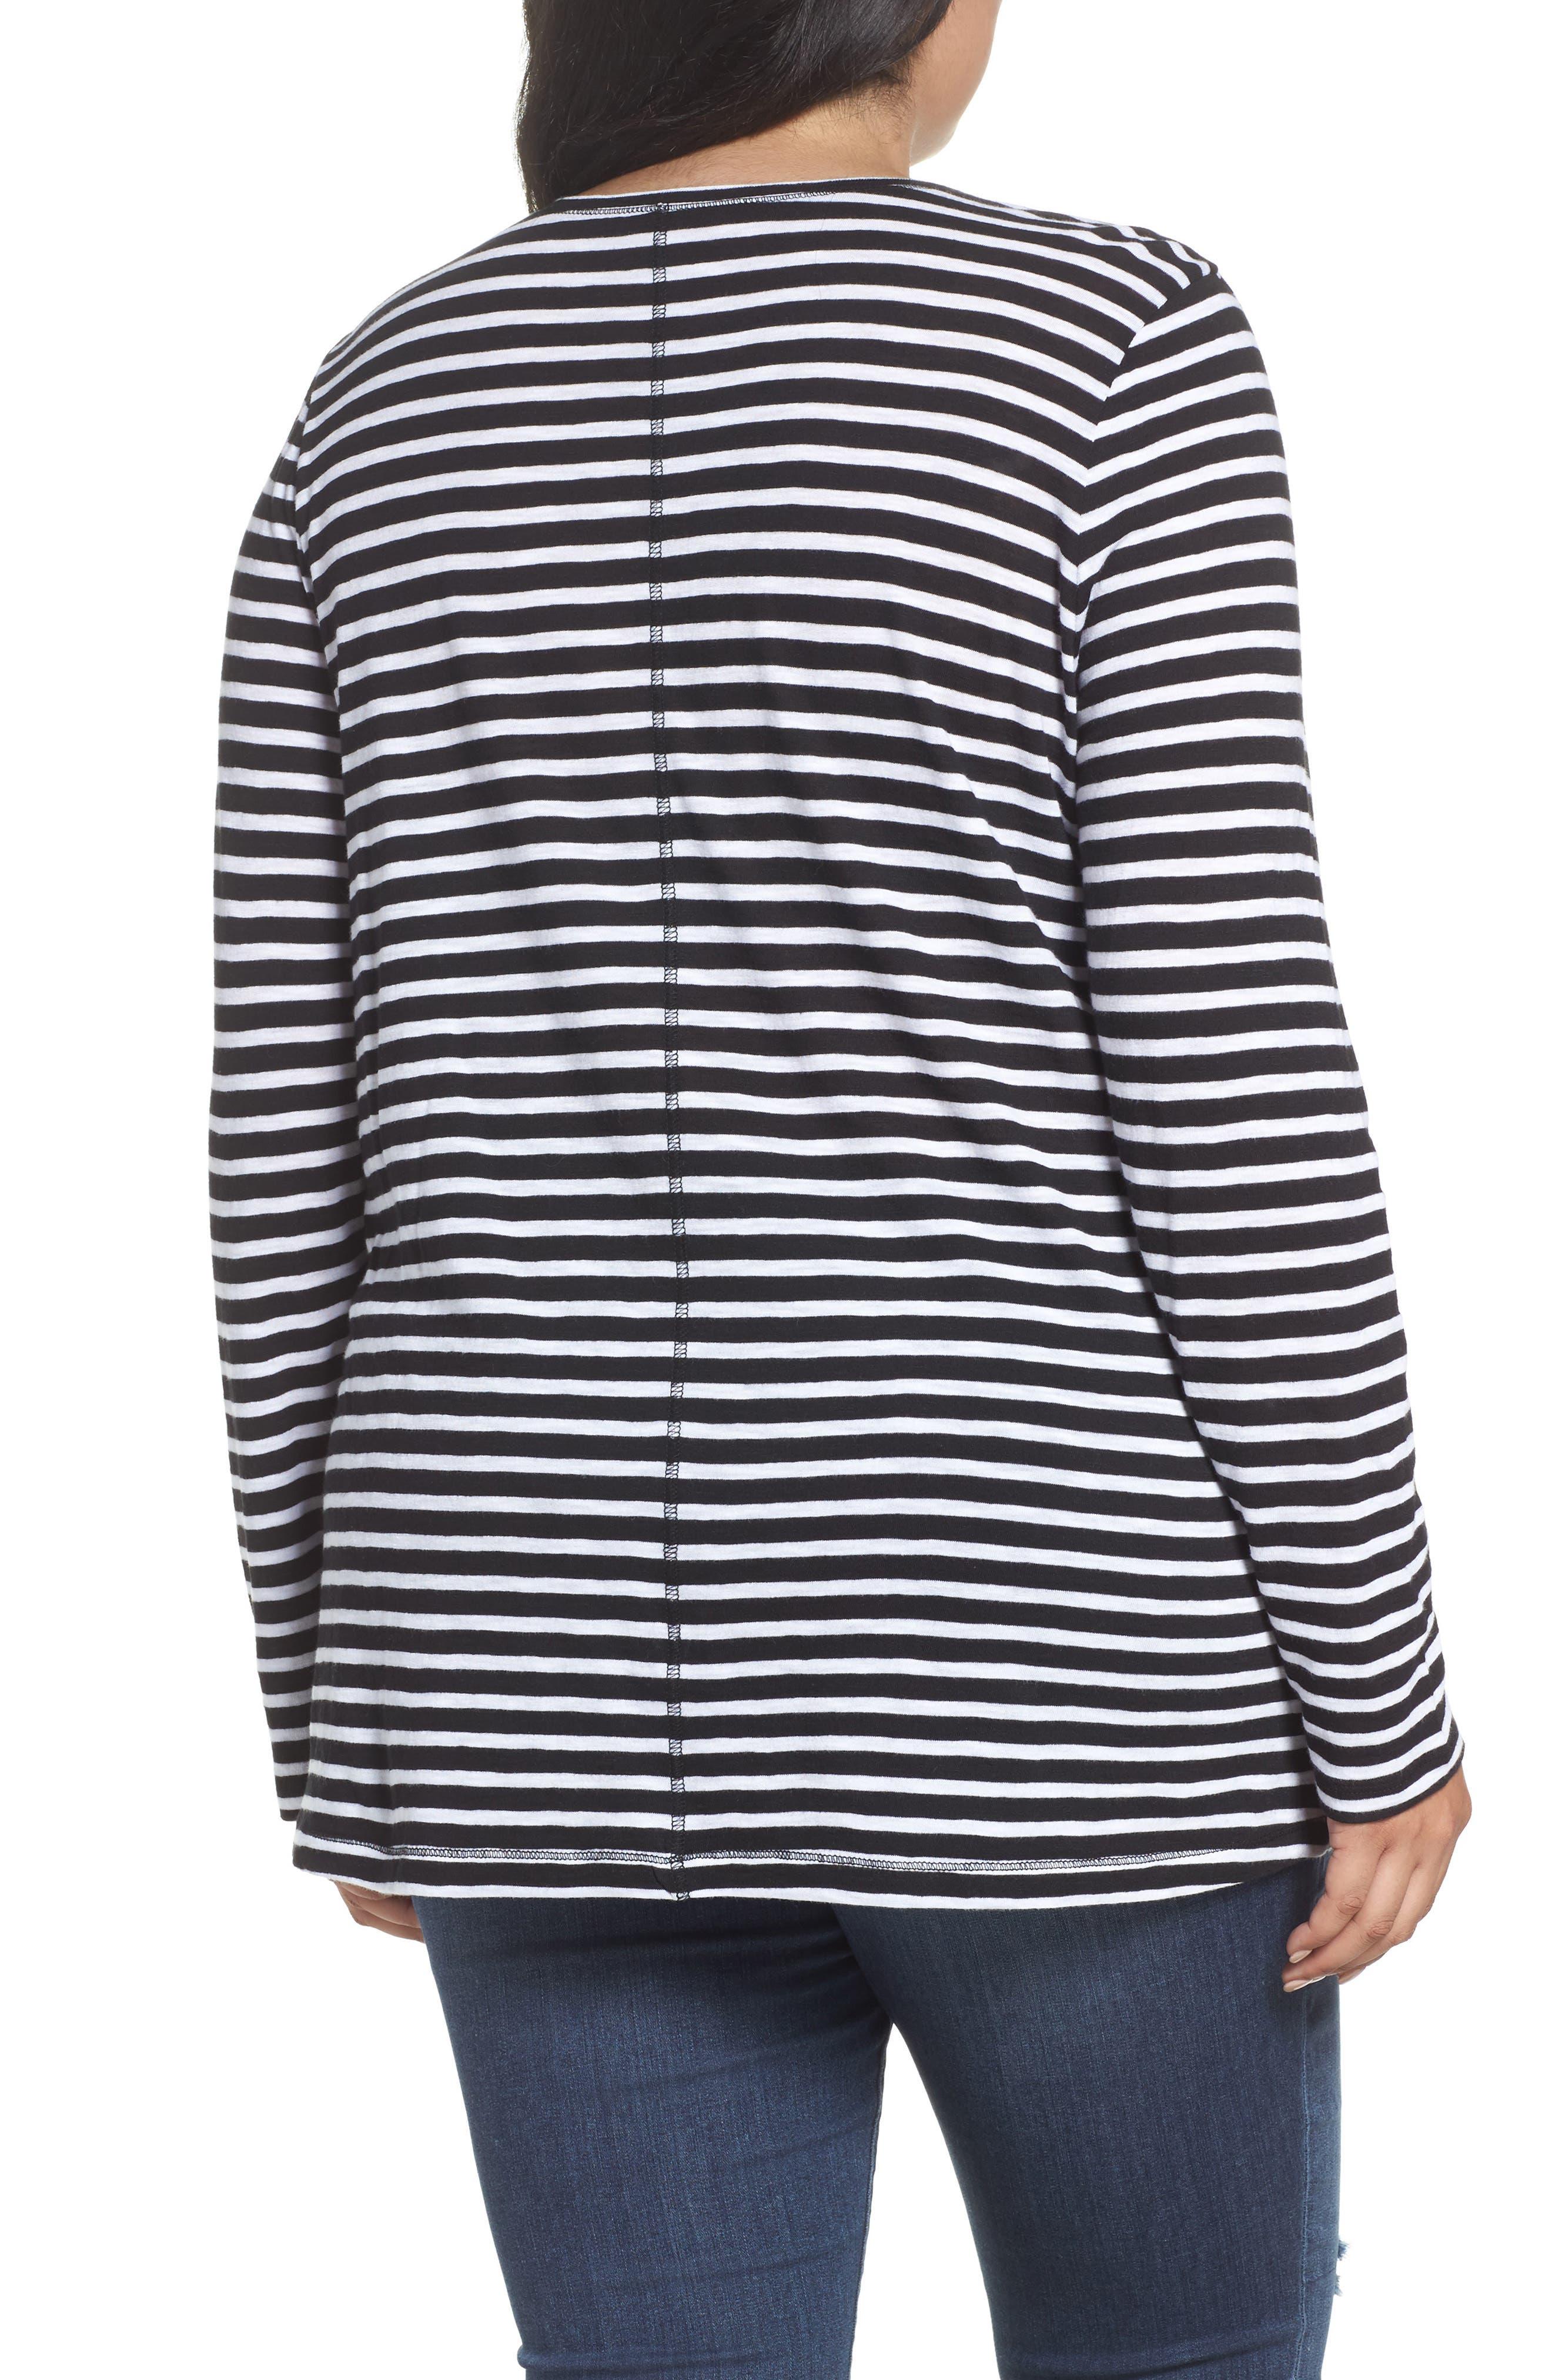 Long Sleeve Crewneck Tee,                             Alternate thumbnail 18, color,                             Black- White Maisie Stripe